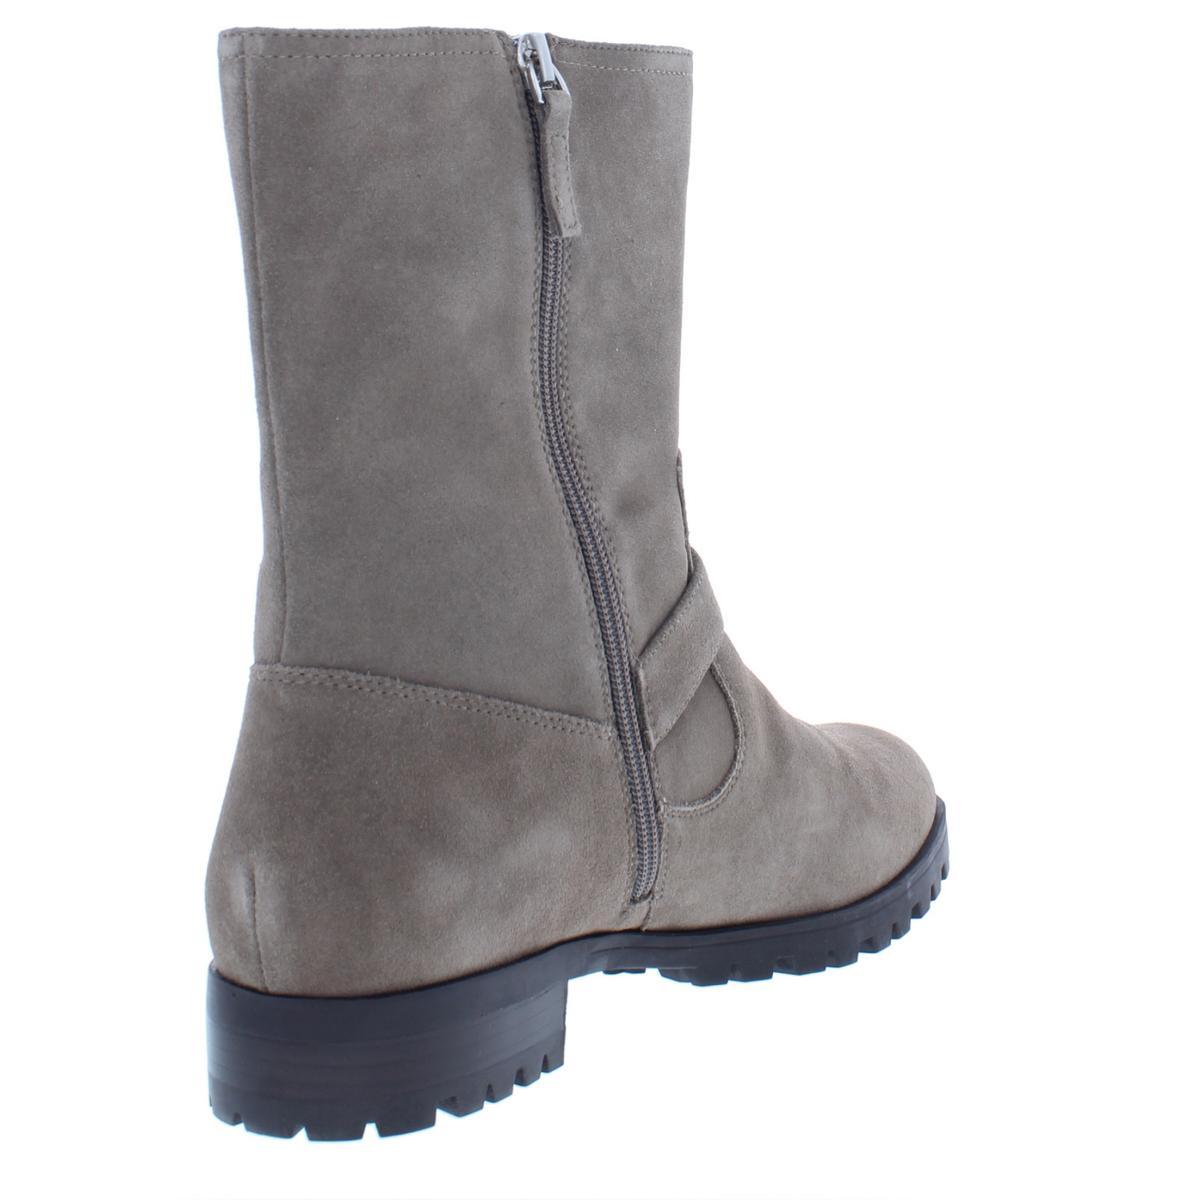 Tahari damen Daria Buckle Mid-Calf Fashion Casual Stiefel schuhe BHFO BHFO BHFO 1920 ce798e